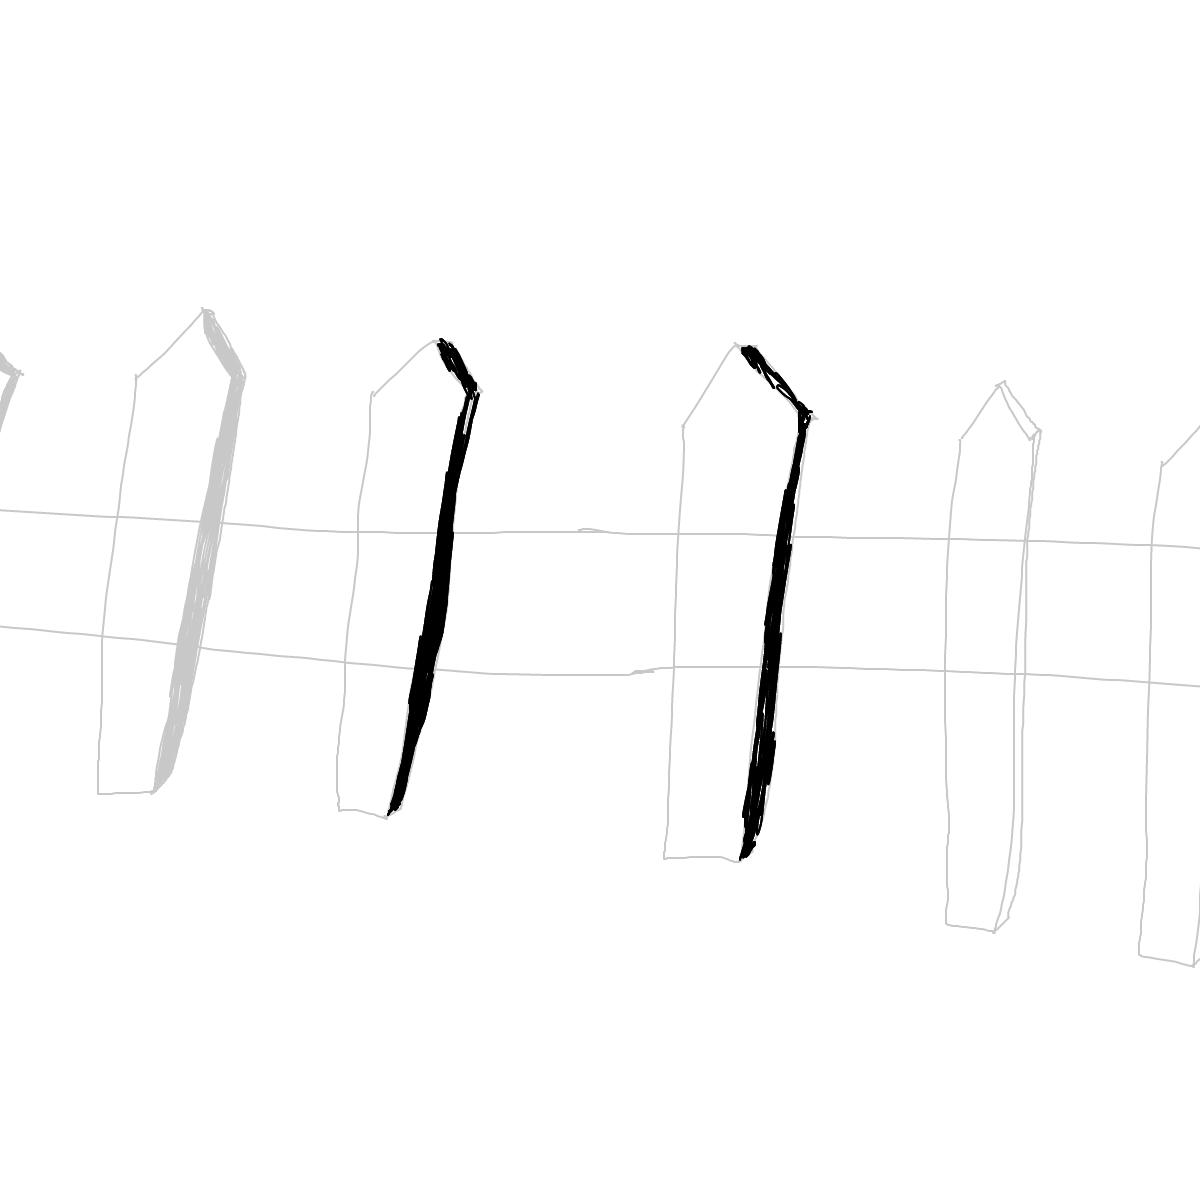 BAAAM drawing#9372 lat:52.4750595092773440lng: 13.4070920944213870